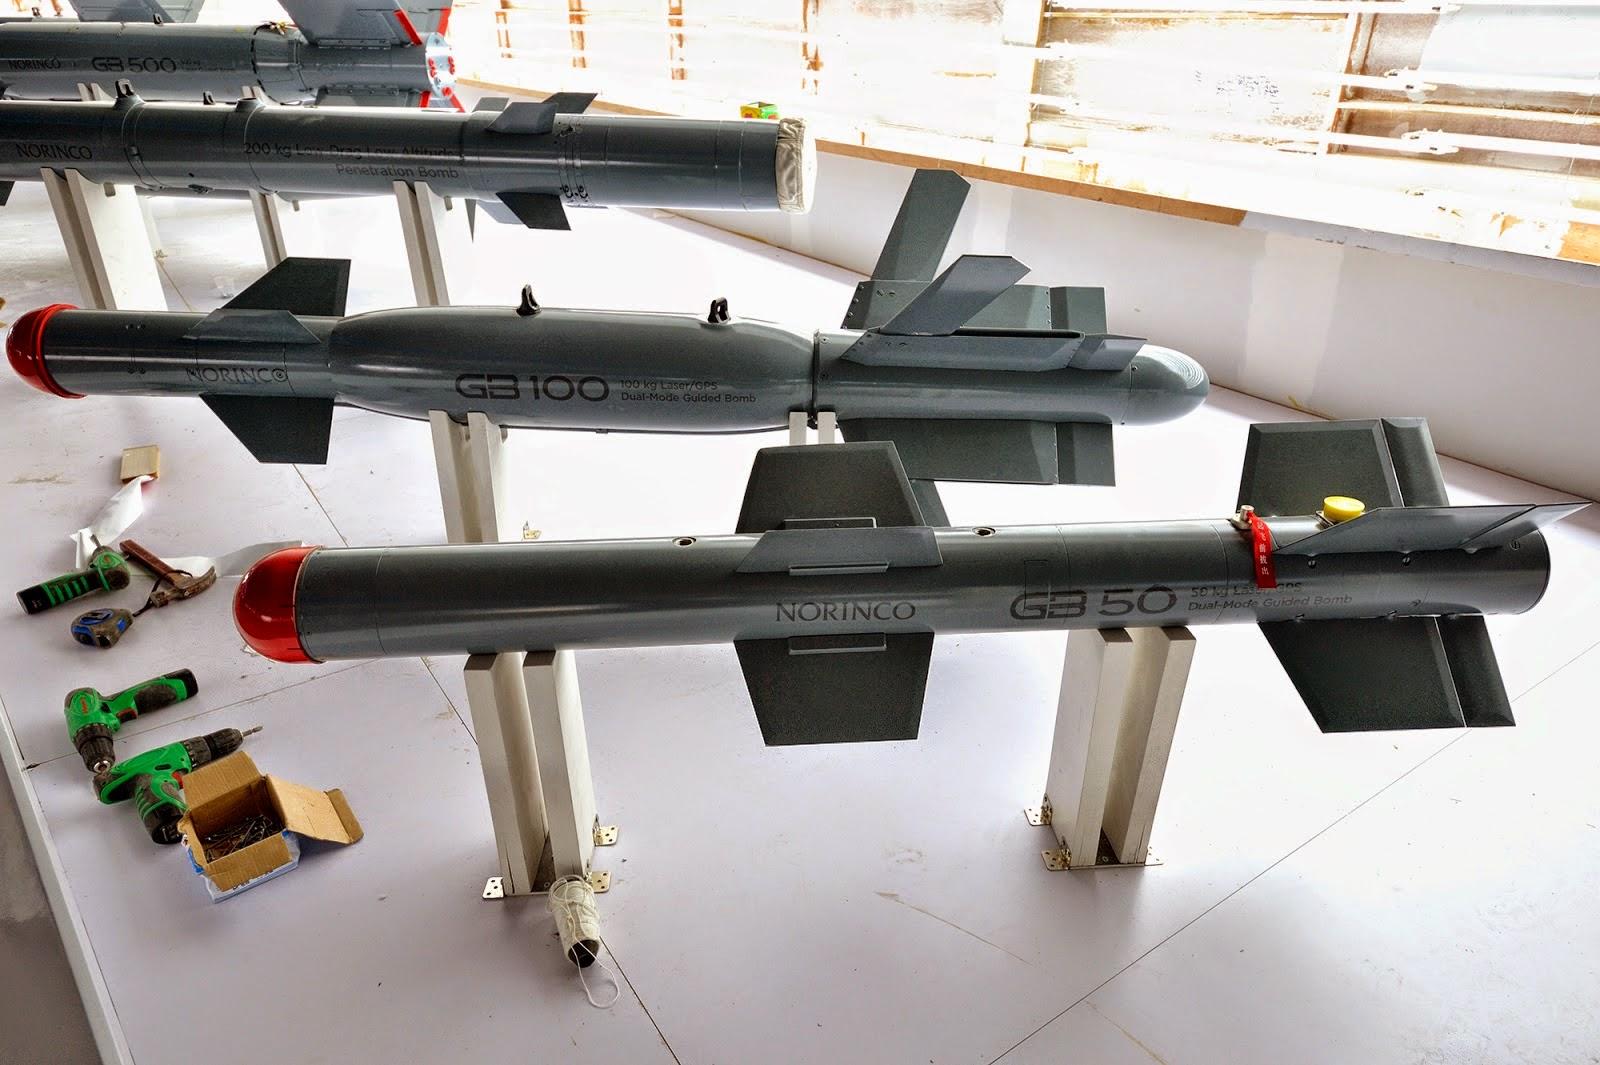 Zhuhai 2014 (11 au 16 Novembre) -  Airshow China 2014      Norinco%2BAir-Launched%2BWeapons%2Bat%2Bdisplay%2Bin%2BZhuhai%2B%2BNorinco%2BGB%2B50%2B100%2B200%2BLaser%2BGPS%2Bguided%2Bbombs%2B1